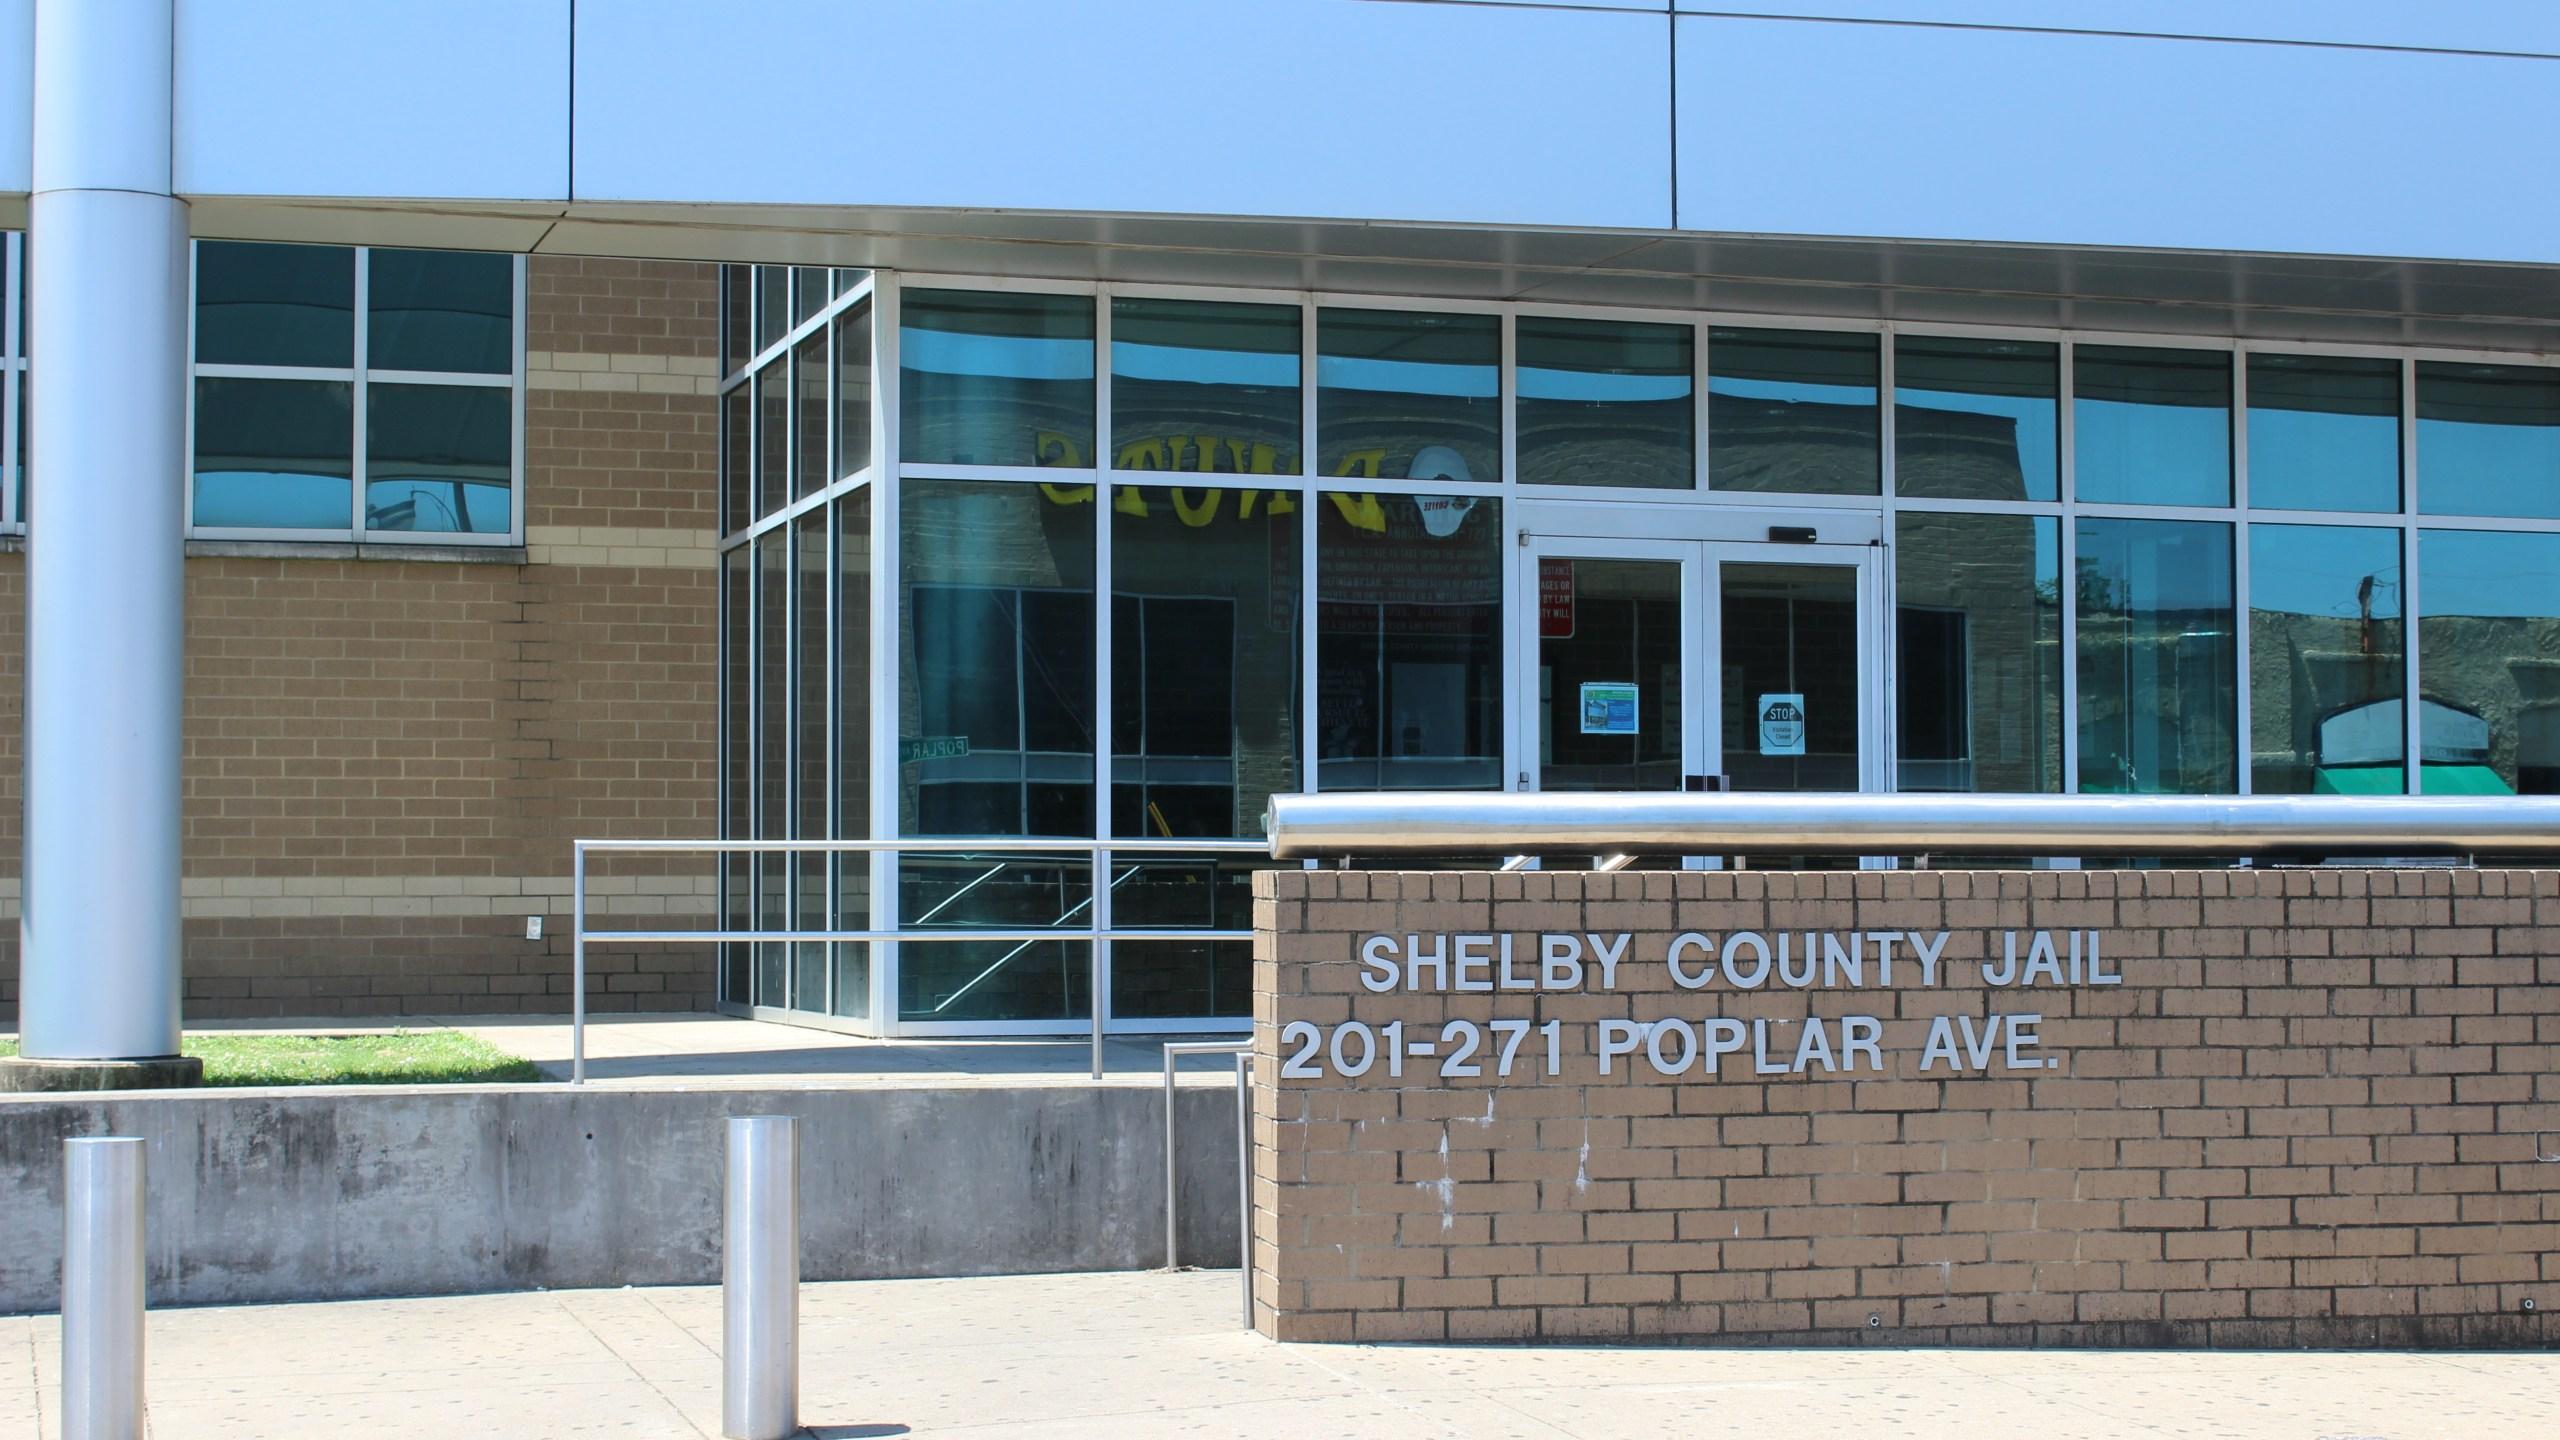 Shelby County Jail_1560545304241.JPG.jpg